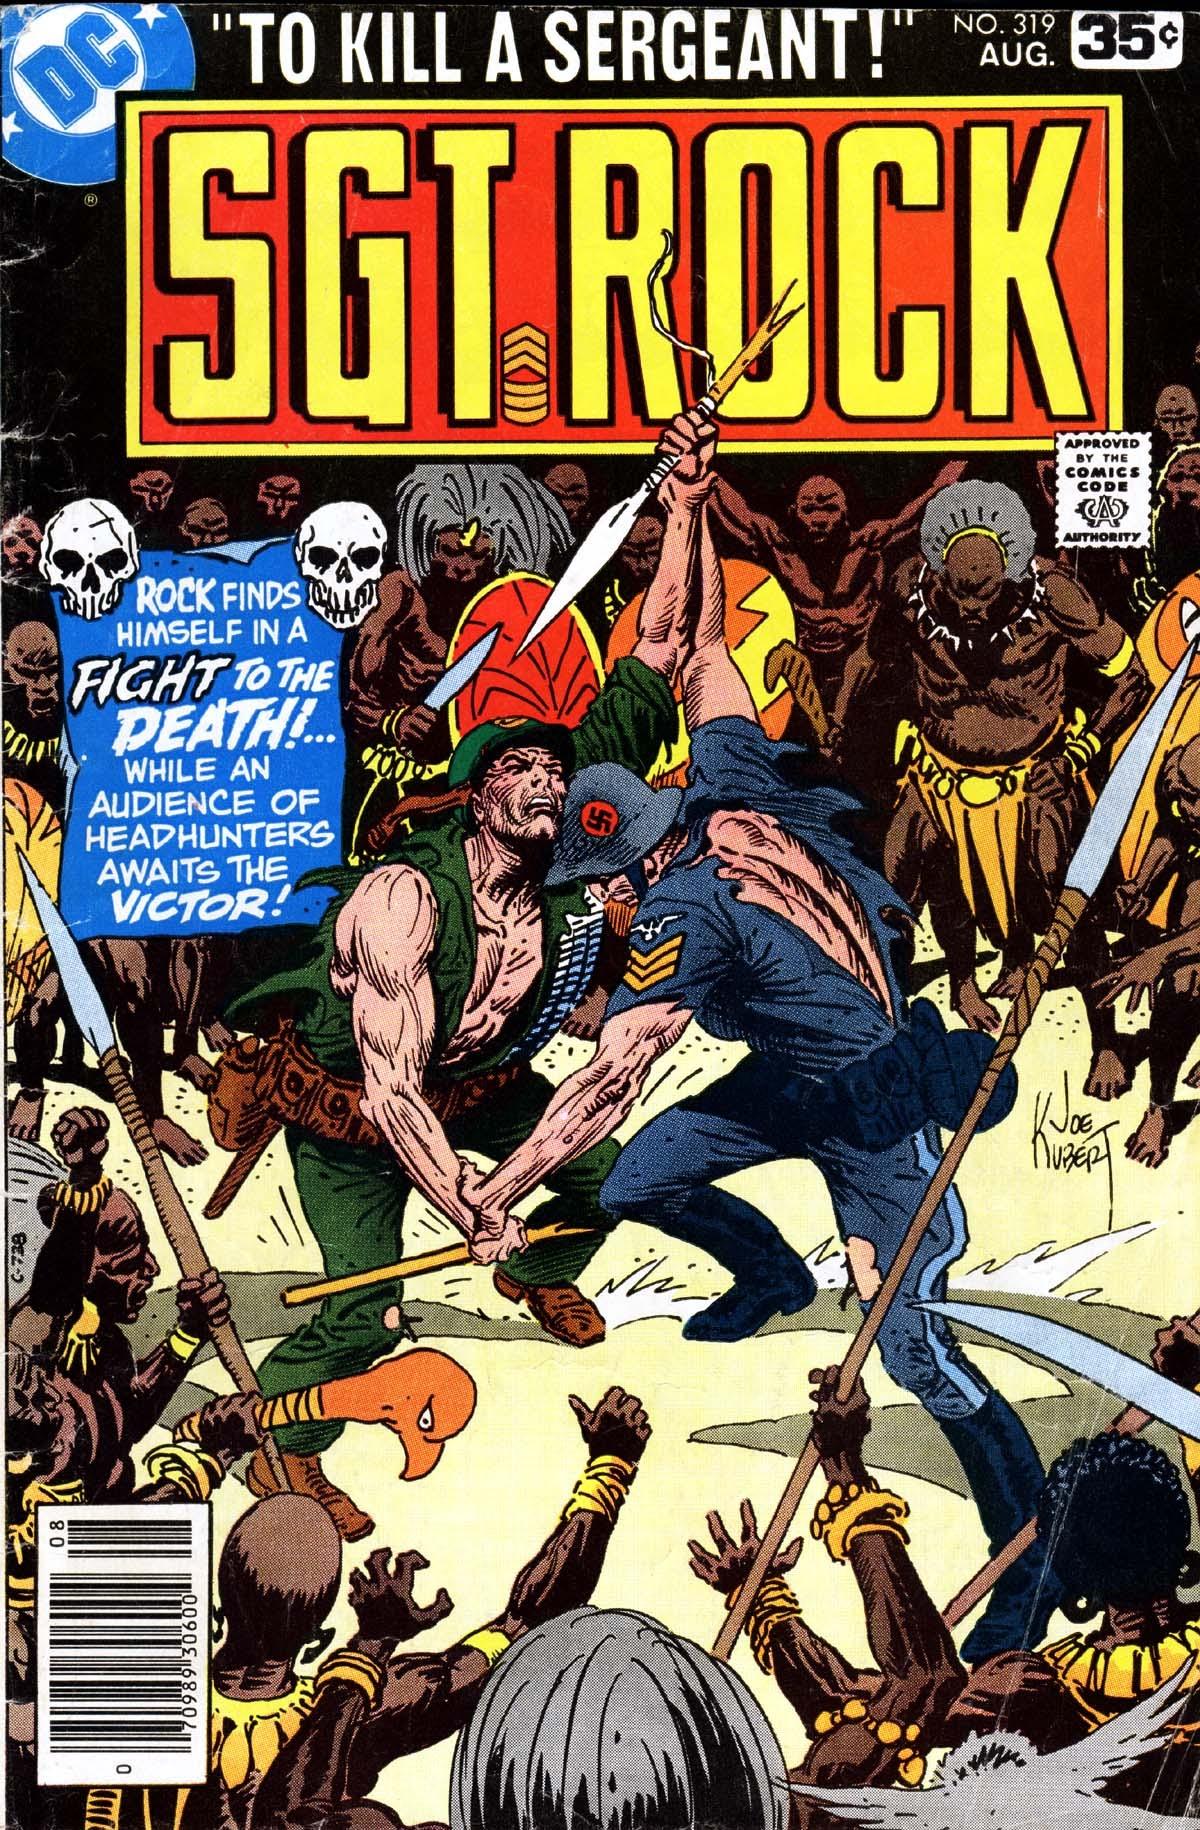 Read online Sgt. Rock comic -  Issue #319 - 1